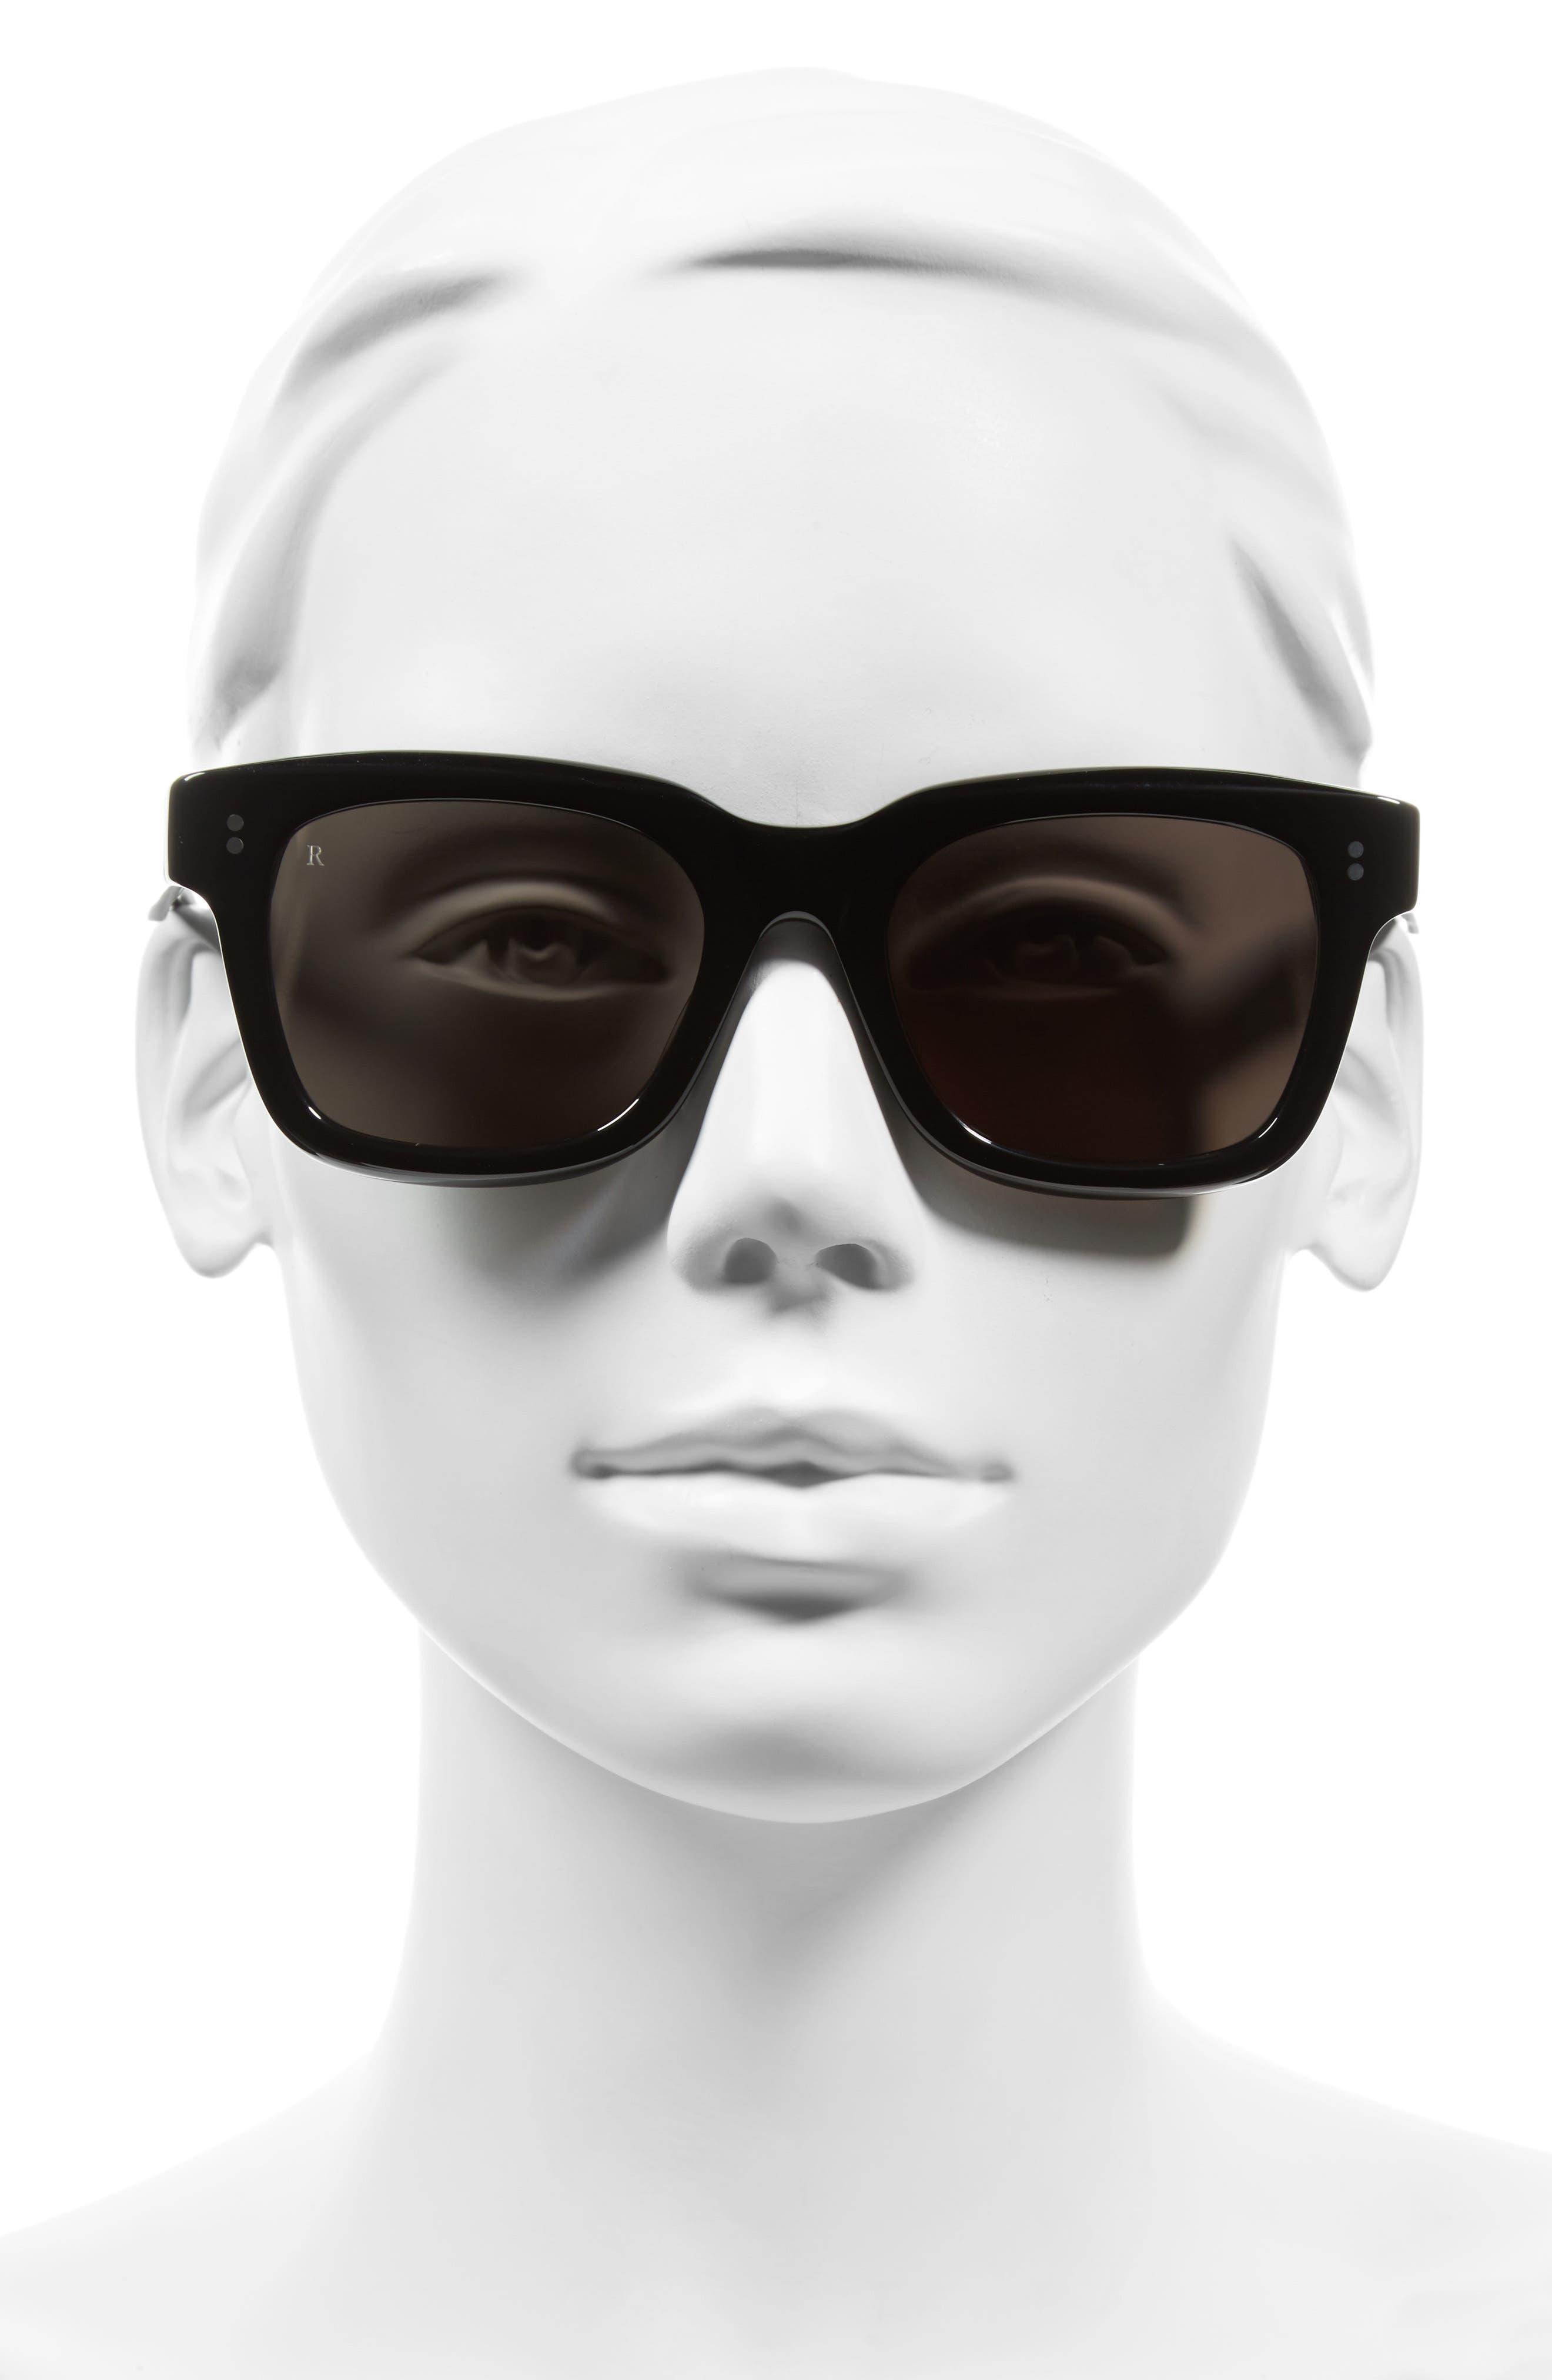 Gilman 52mm Sunglasses,                             Alternate thumbnail 2, color,                             001